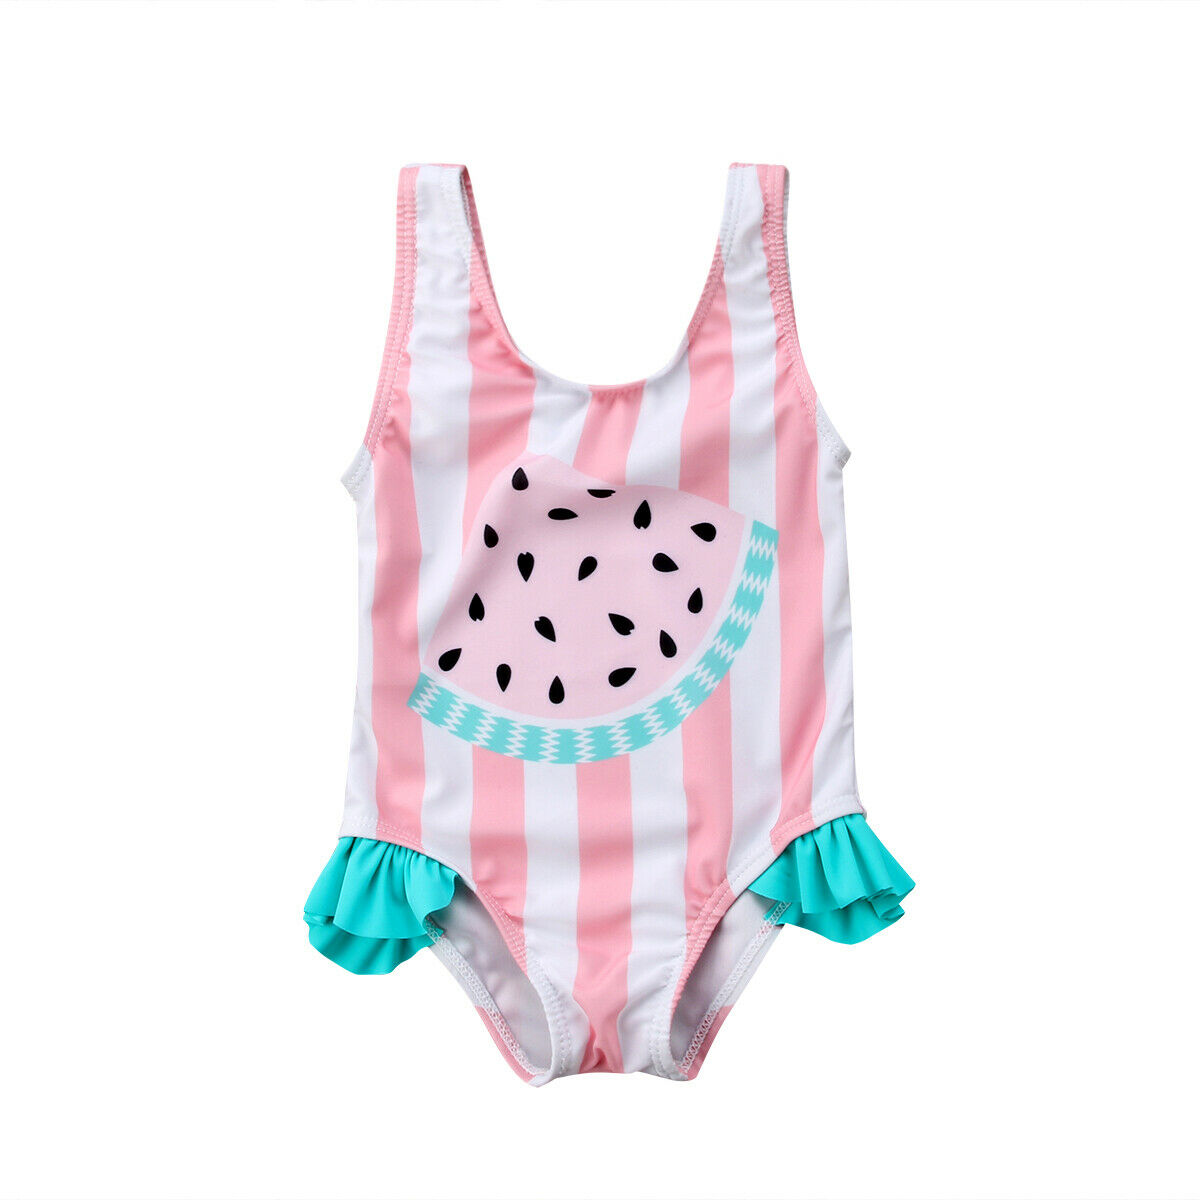 2019 Baby Girls Cute Swimwear Bow Tankini Bikini Swimsuit Bathing Suit Beachwear